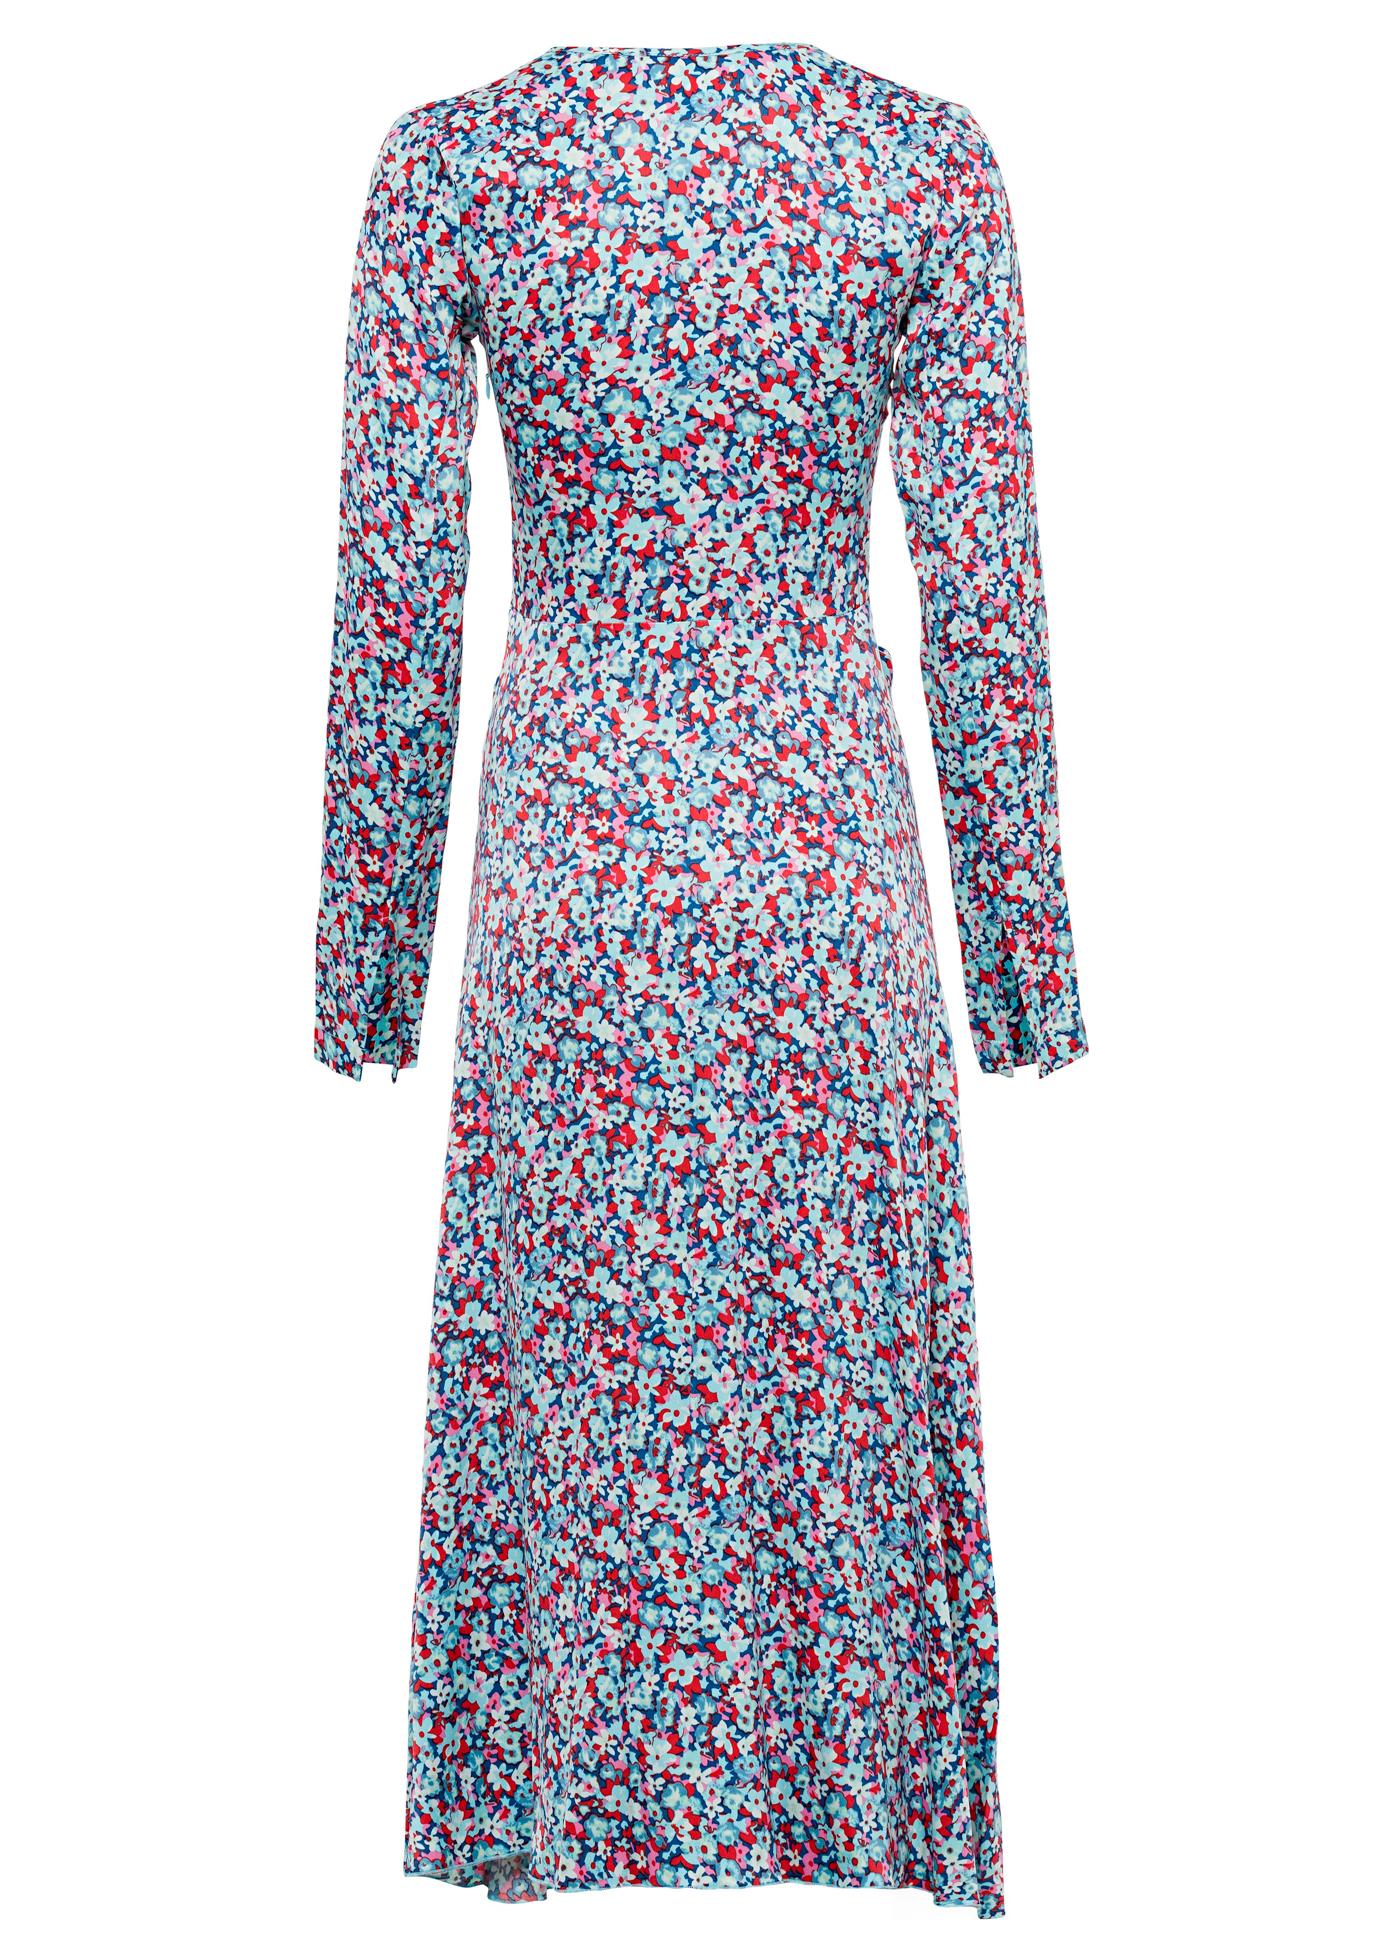 Sierra Dress image number 1